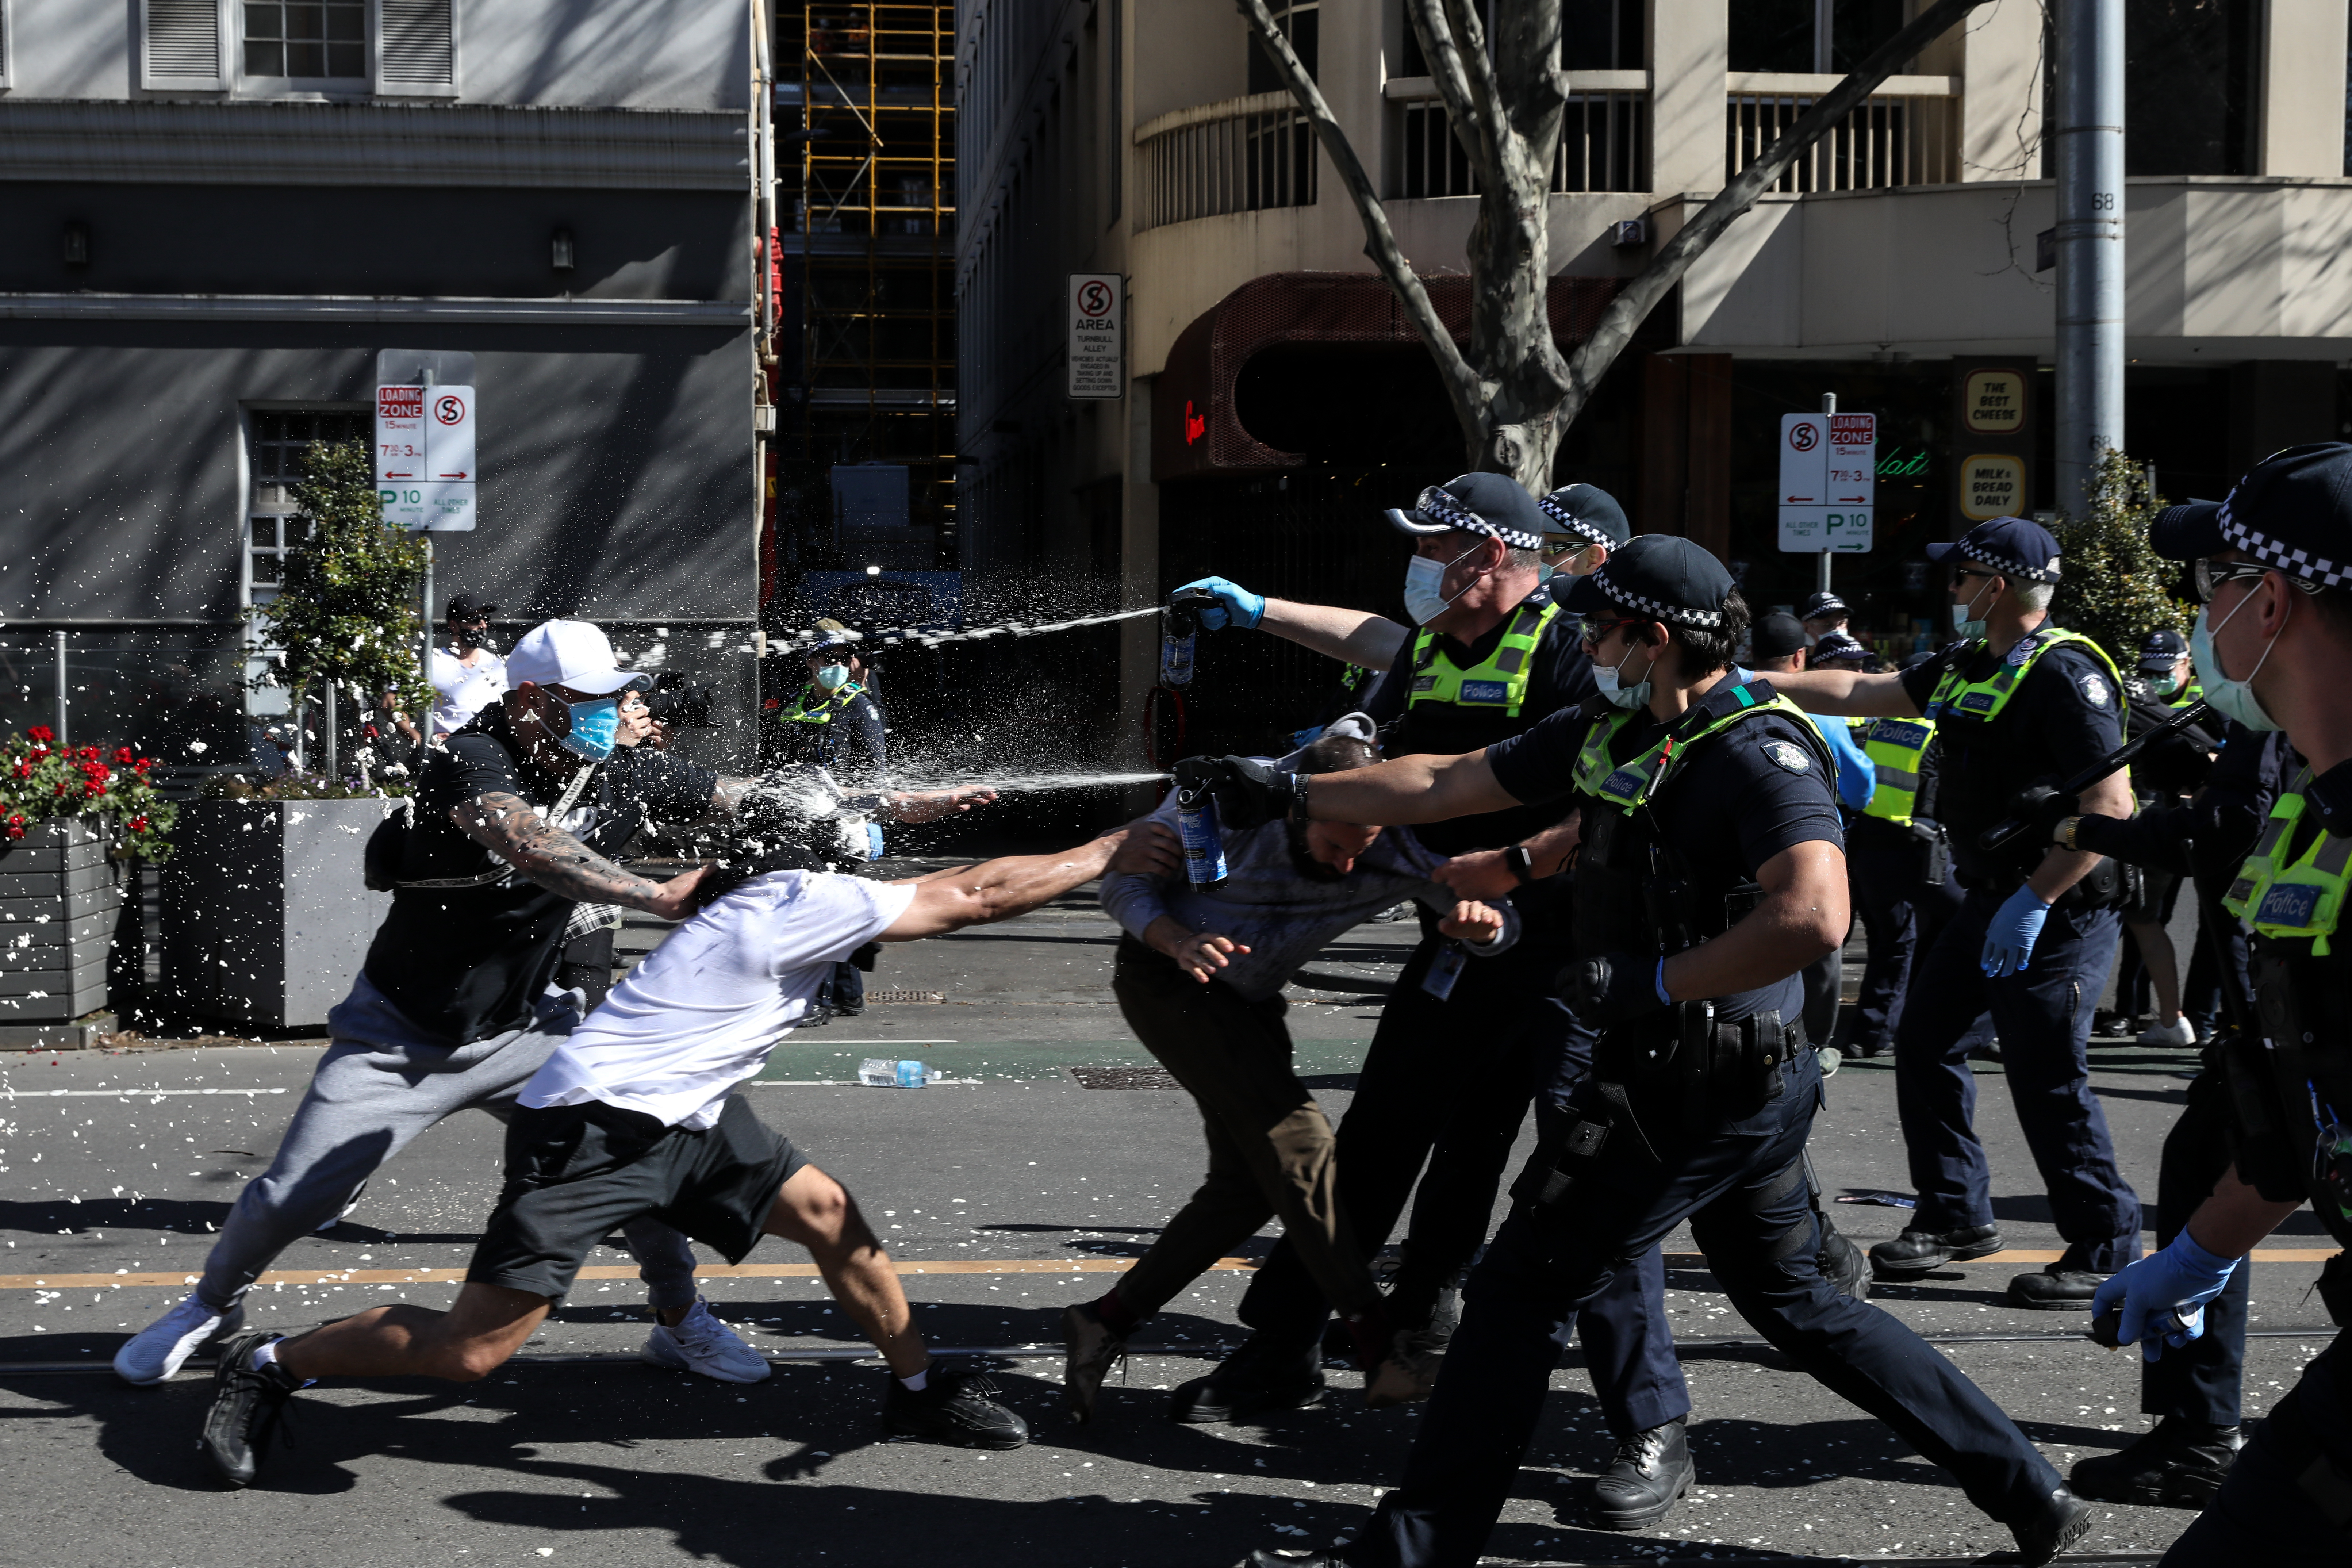 Melbourne anti-lockdown protests, Saturday August 21, 2021